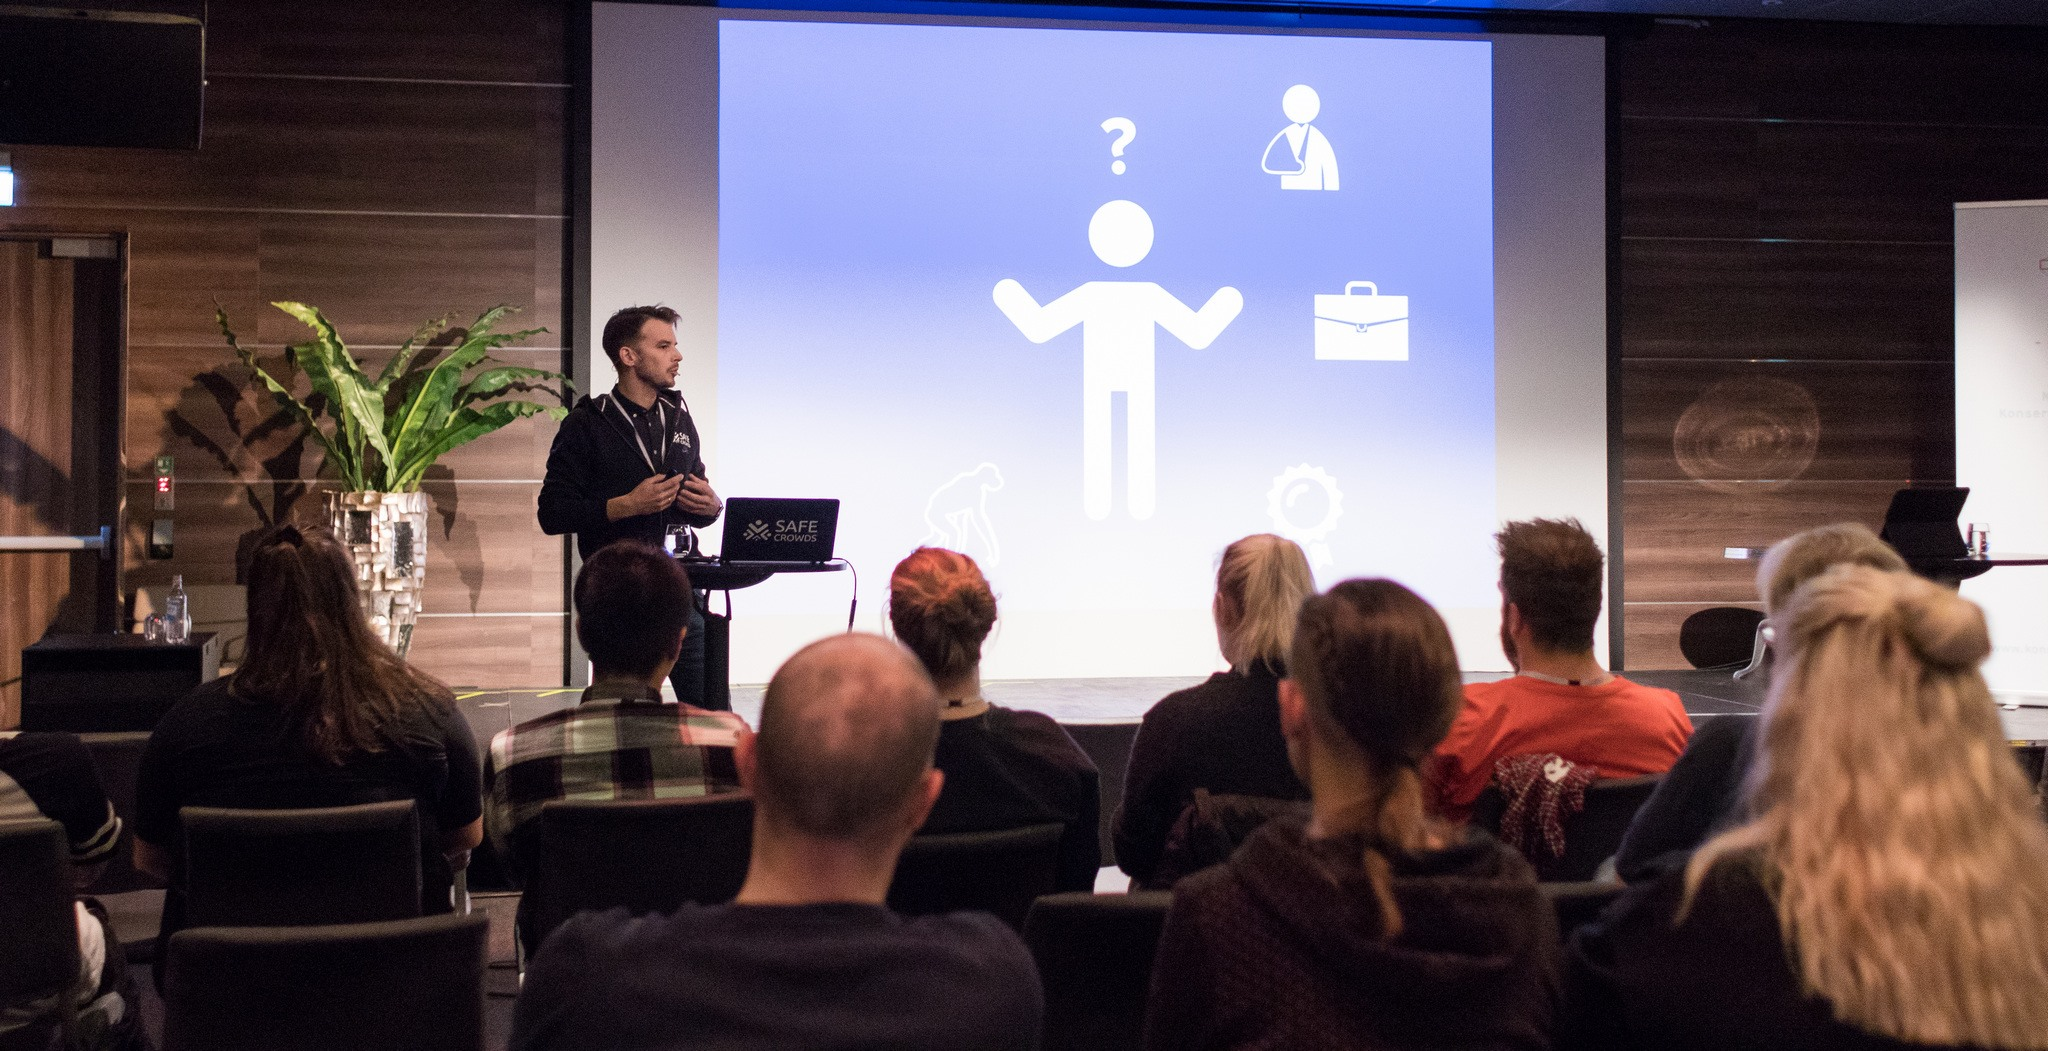 Stian Strømseth holder HMS-foredrag under Arrangørkonferansen 2017 i regi av Norske Konsertarrangører (NKA). Foto: Jørund Føreland Pedersen.